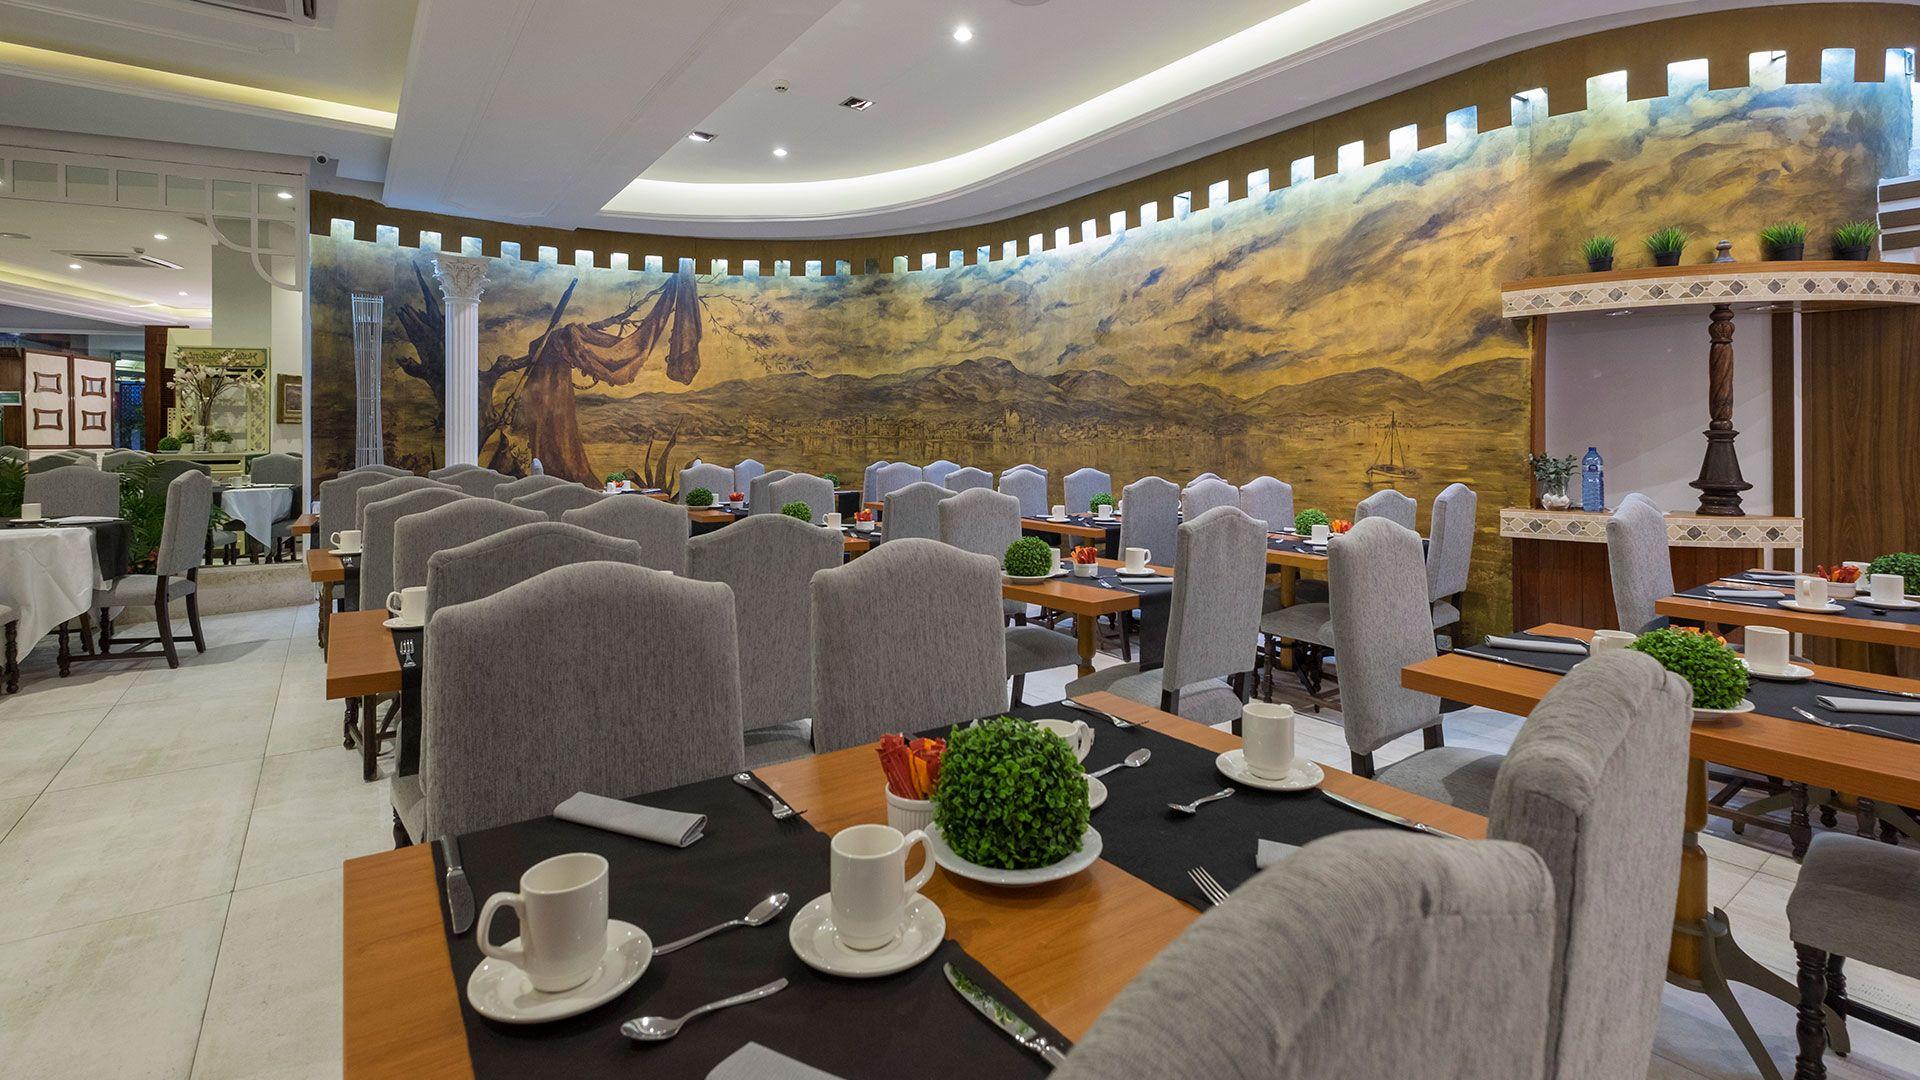 Hotel President <br>by BRAVA HOTELES